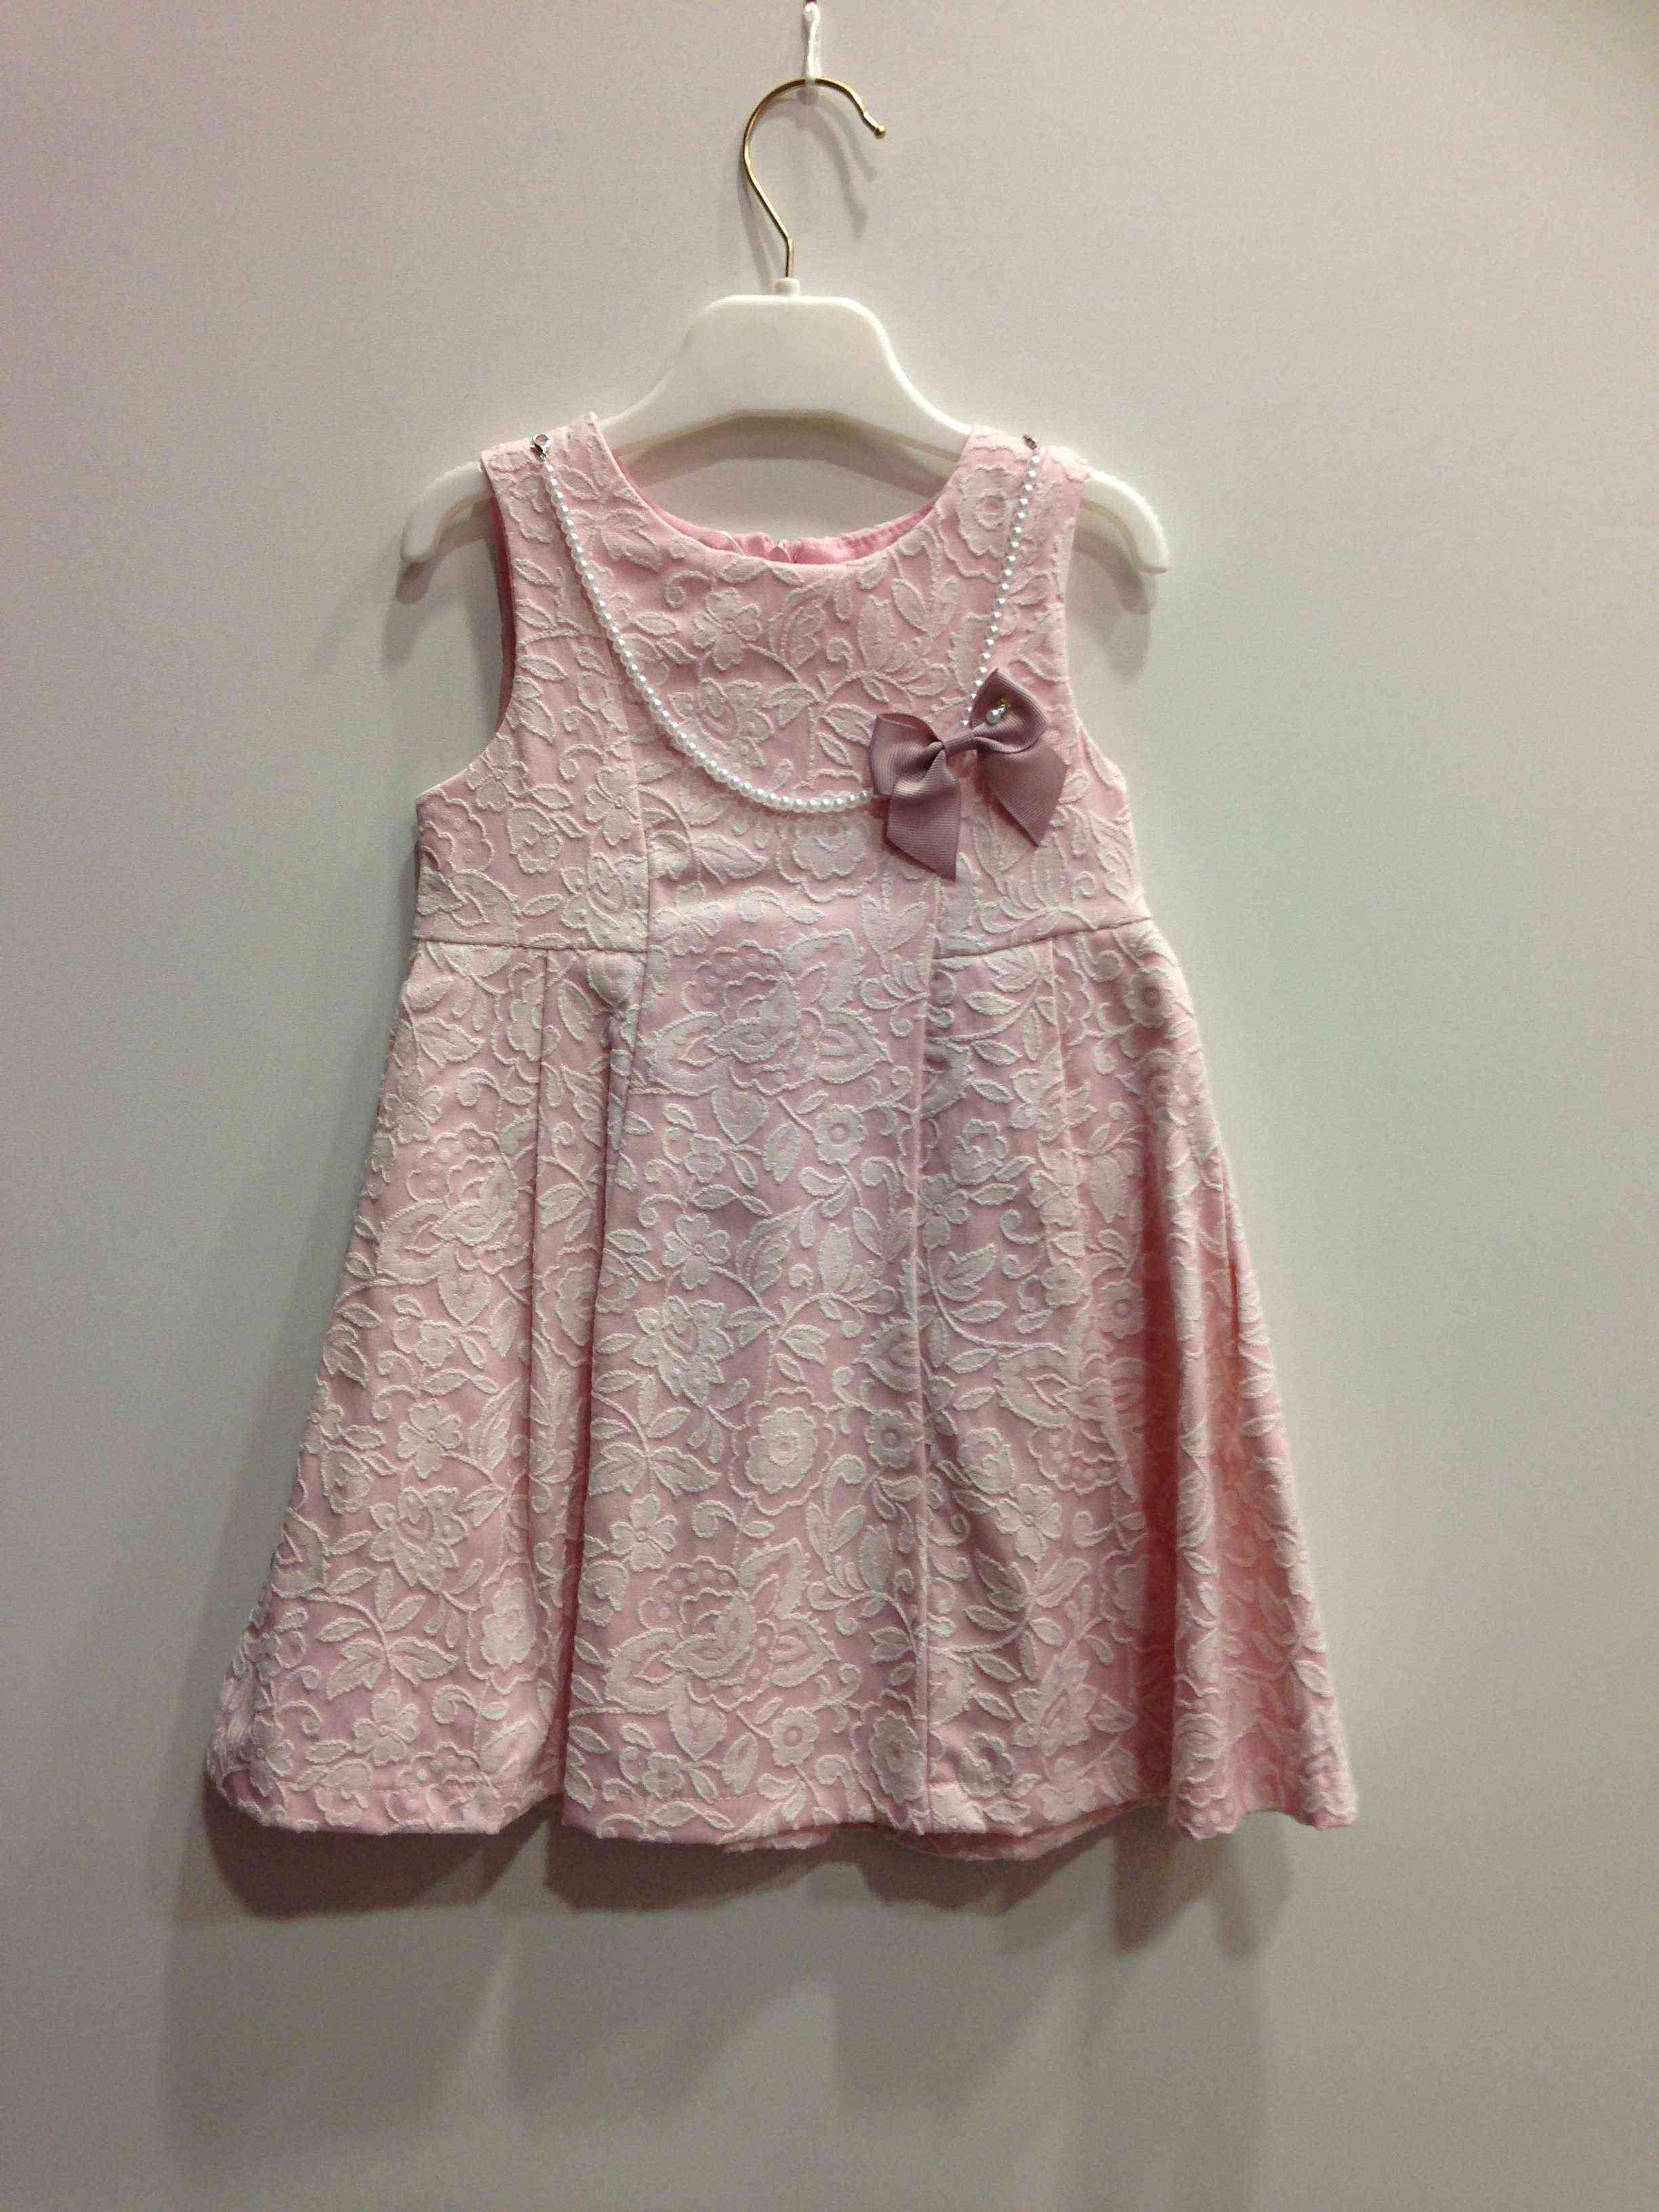 bc931b65a86 Babylon φόρεμα ροζ αμάνικο με αποσπώμενο κολιέ φιόγκο -